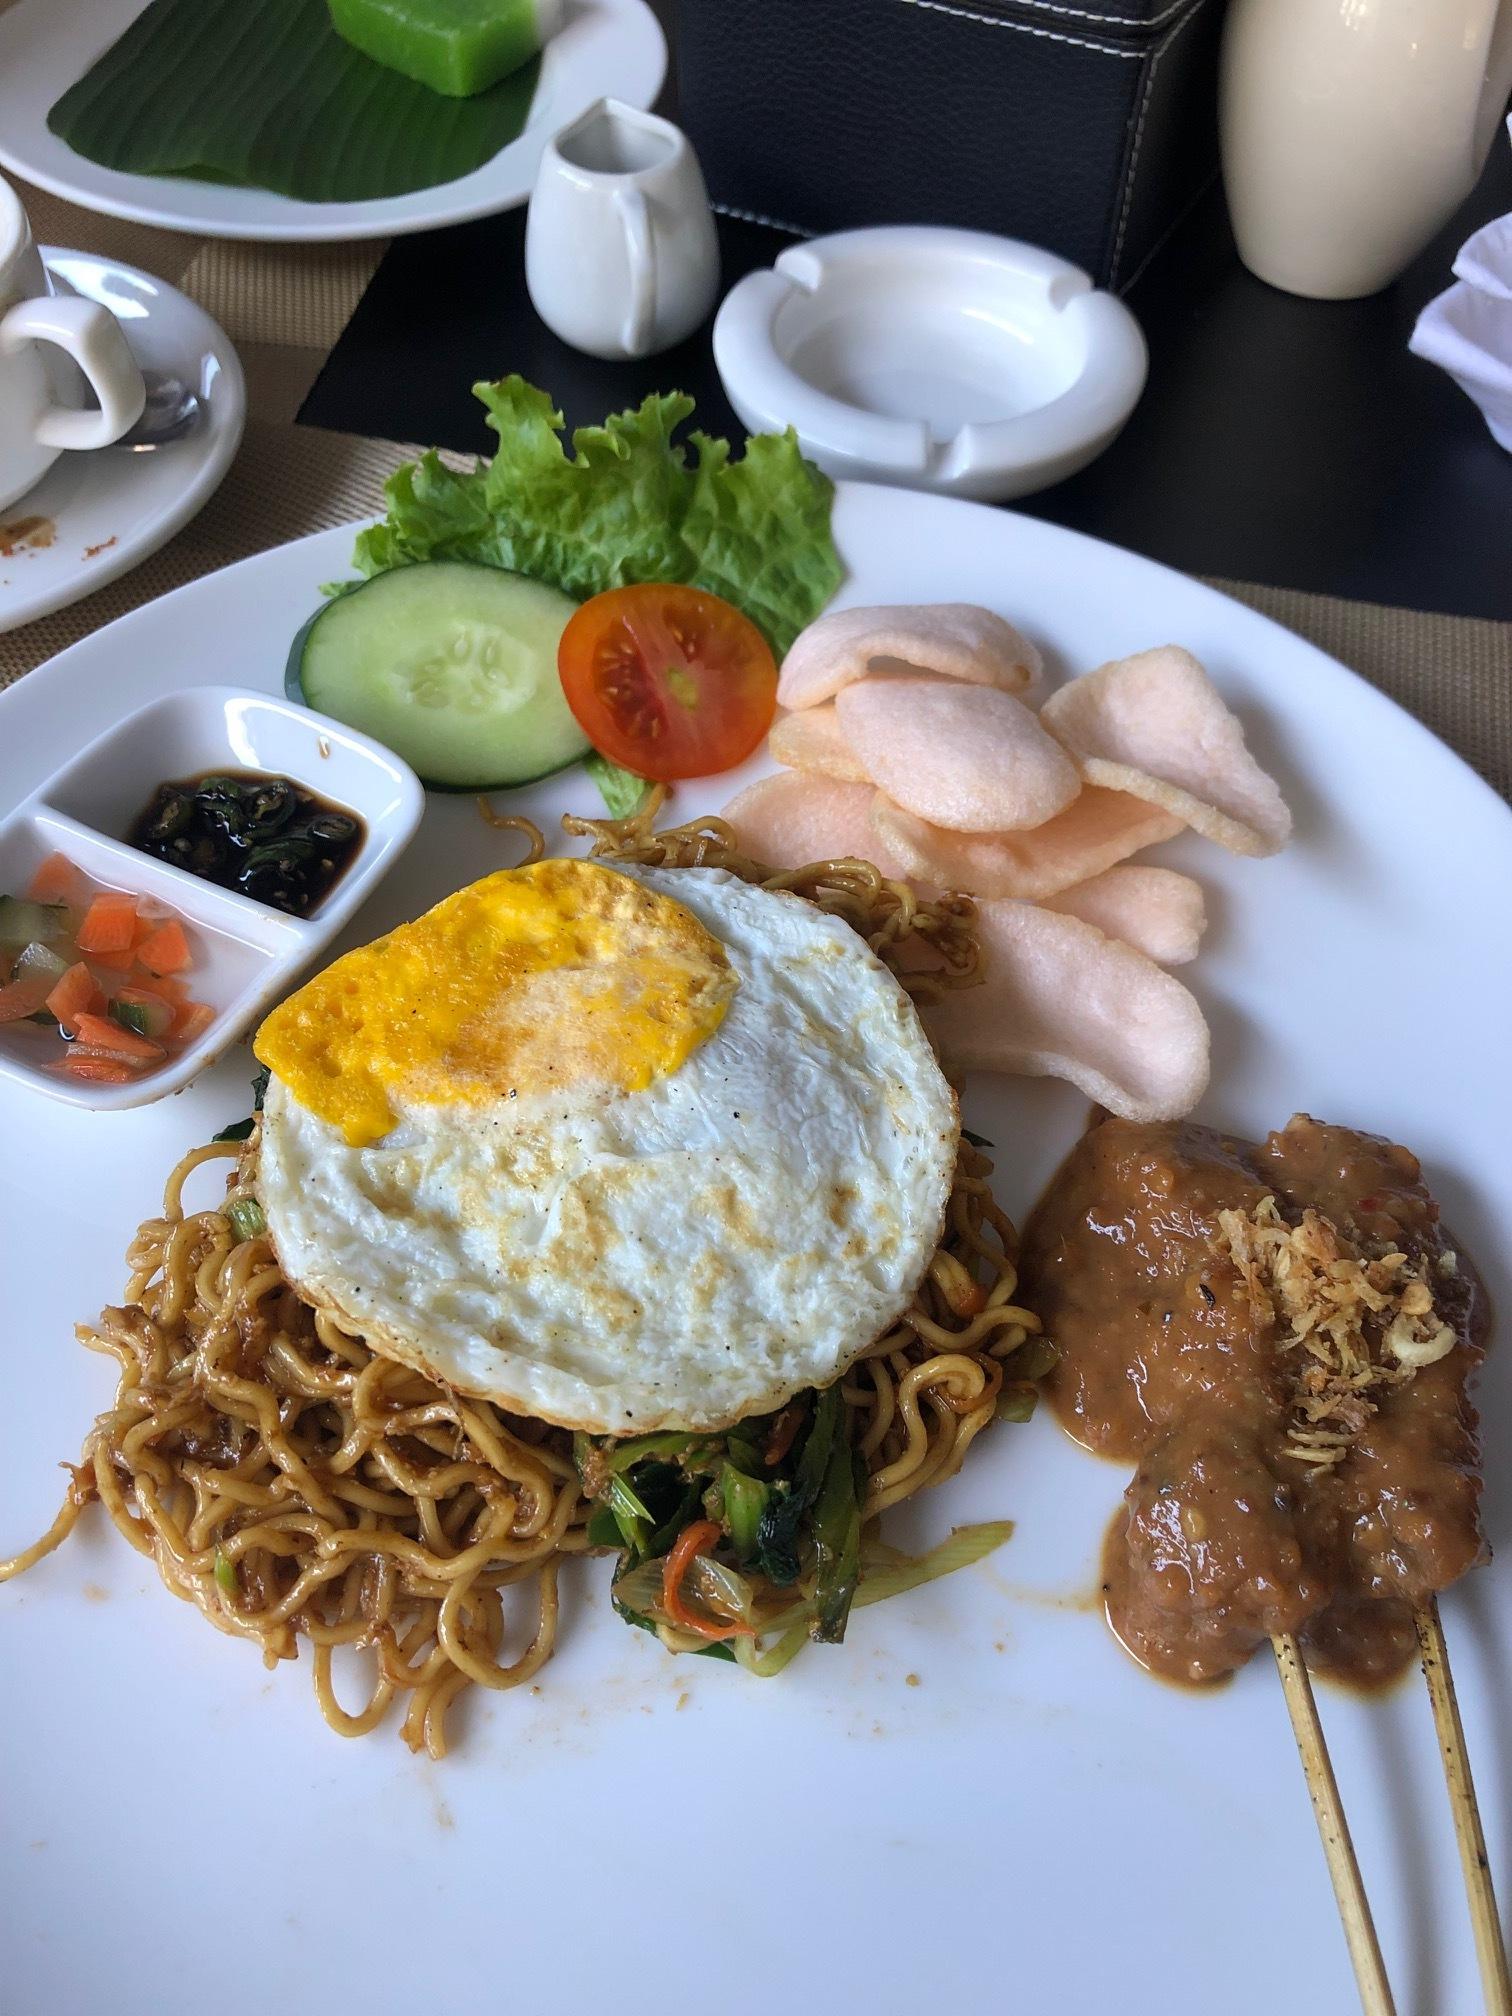 Continental breakfast, Indonesian Breakfast. It was pretty good.